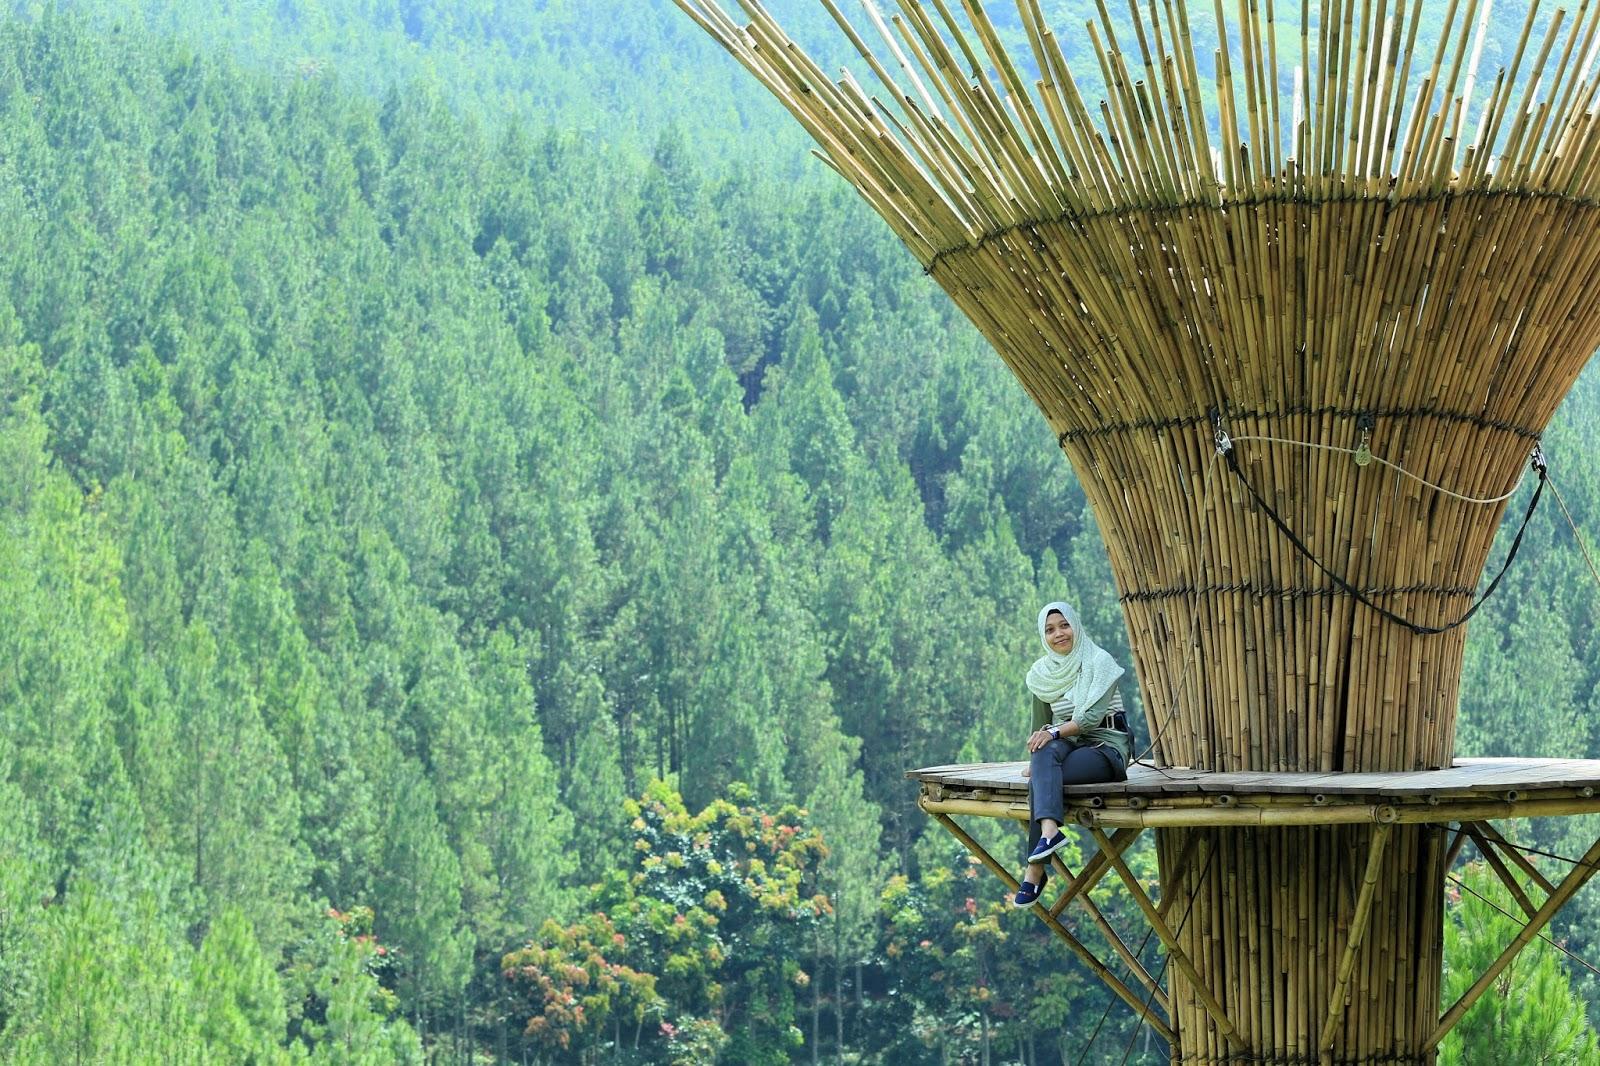 bamboo sky the lodge maribaya